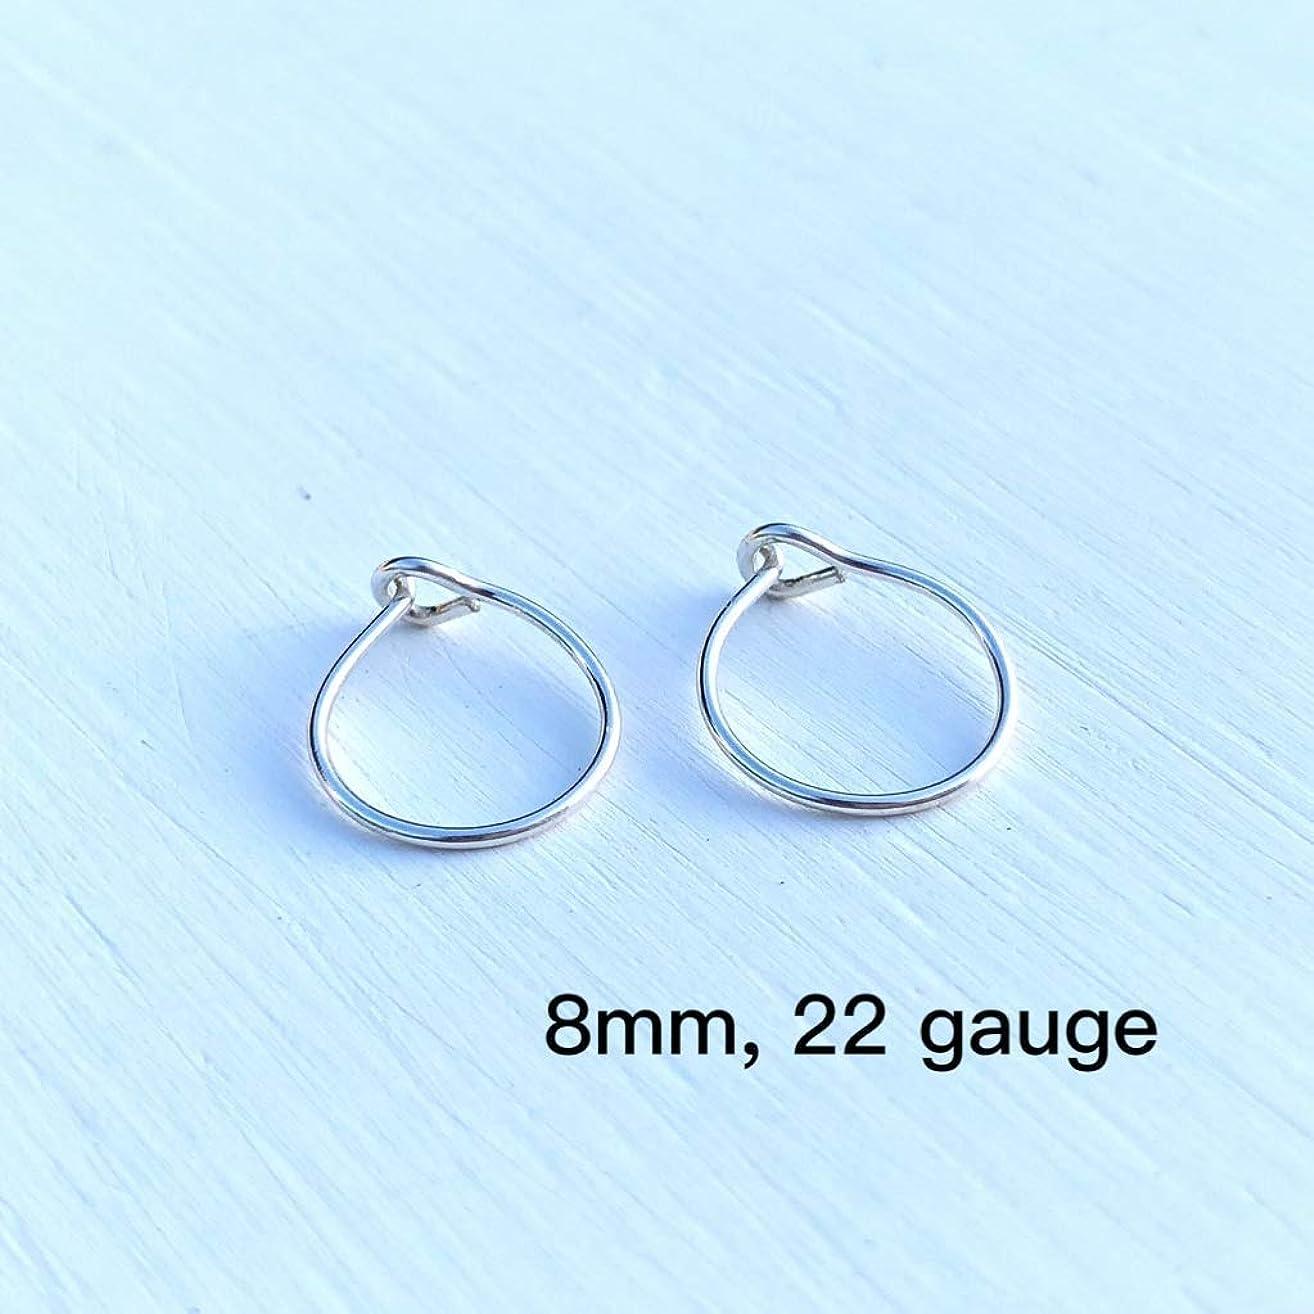 Extra Small Sterling Silver Hoop Earrings 8mm, Handmade Tiny Thin Hoops, 22 Gauge